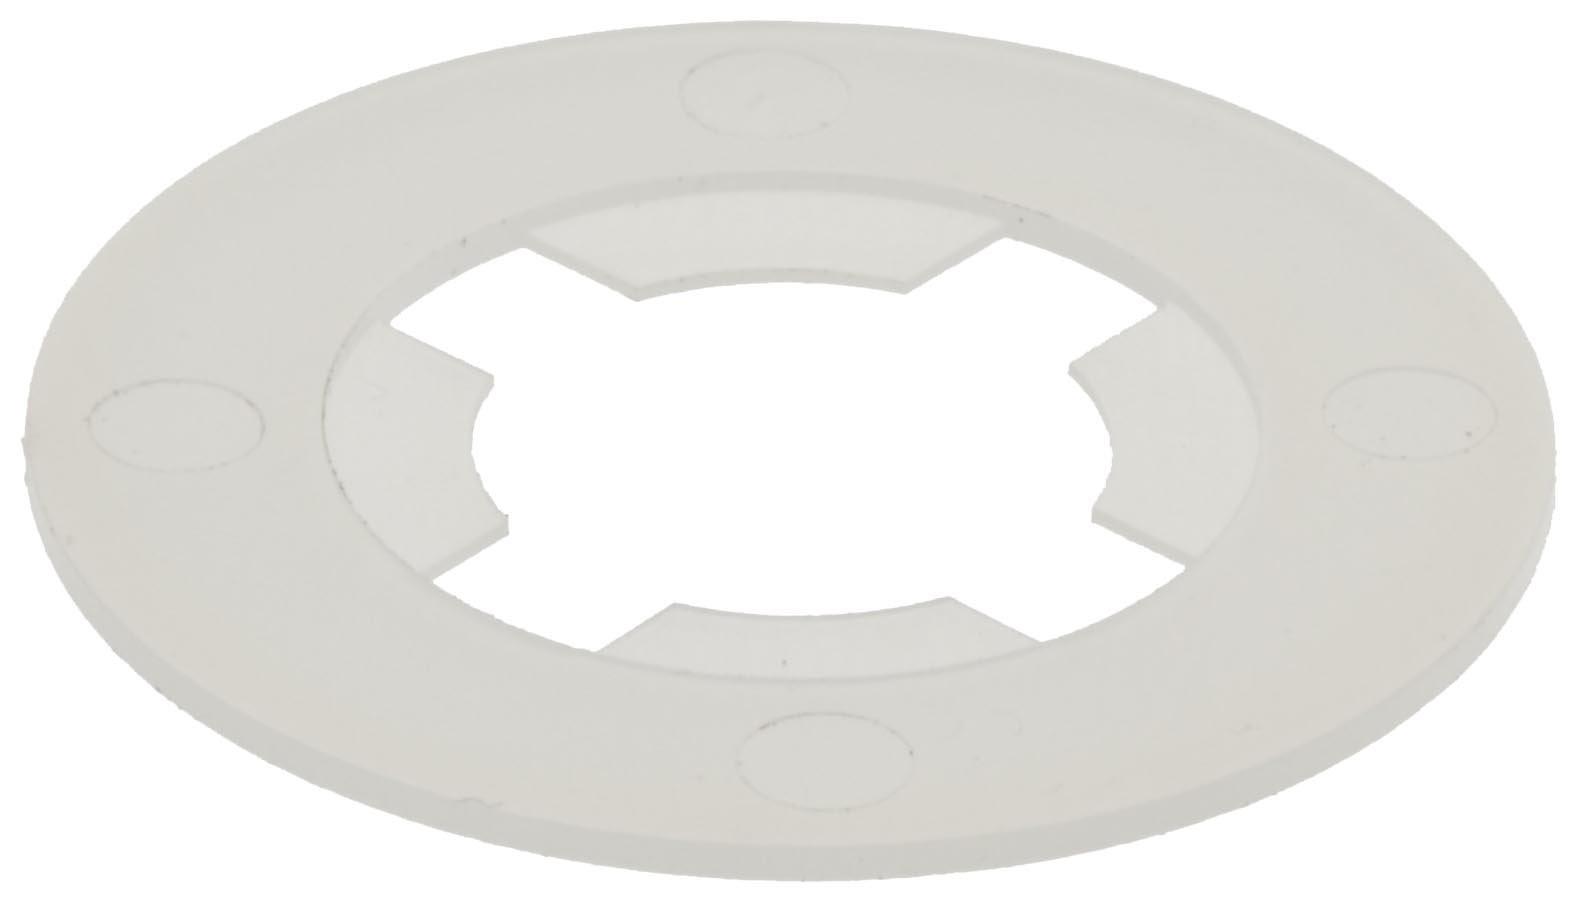 "Nylon 6/6 Retaining Washer, White, 7/16"" Hole Size, 0.5700"" ID, 1-1/32"" OD, 0.0620"" Nominal Thickness (Pack of 100)"